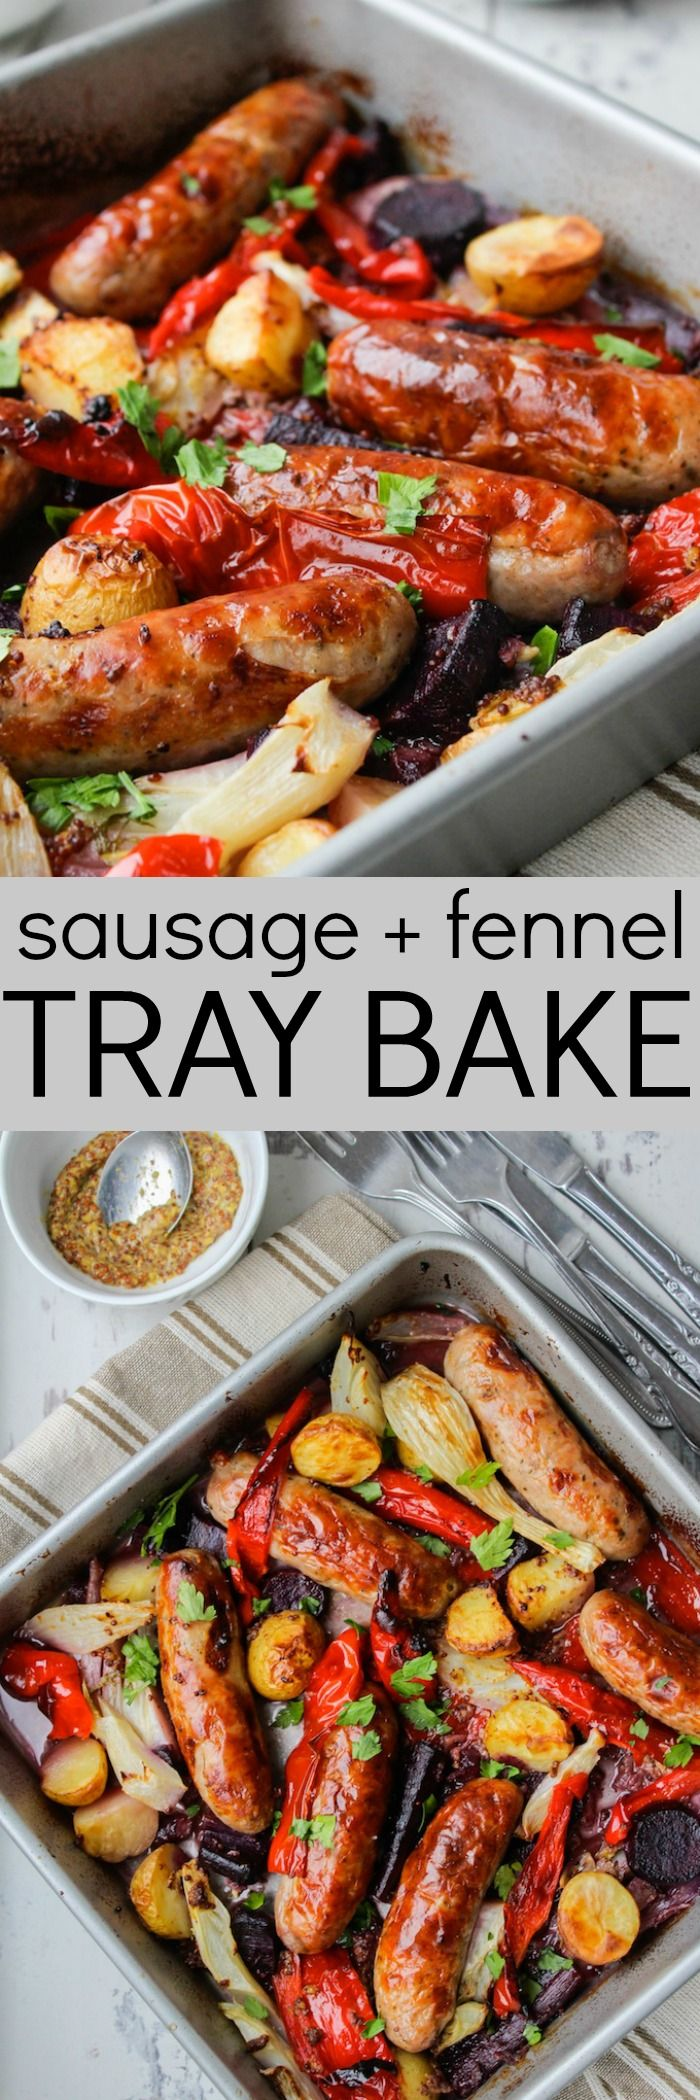 Easy Roast Dinner of Sausage + Fennel Tray Bake @asaucykitchen